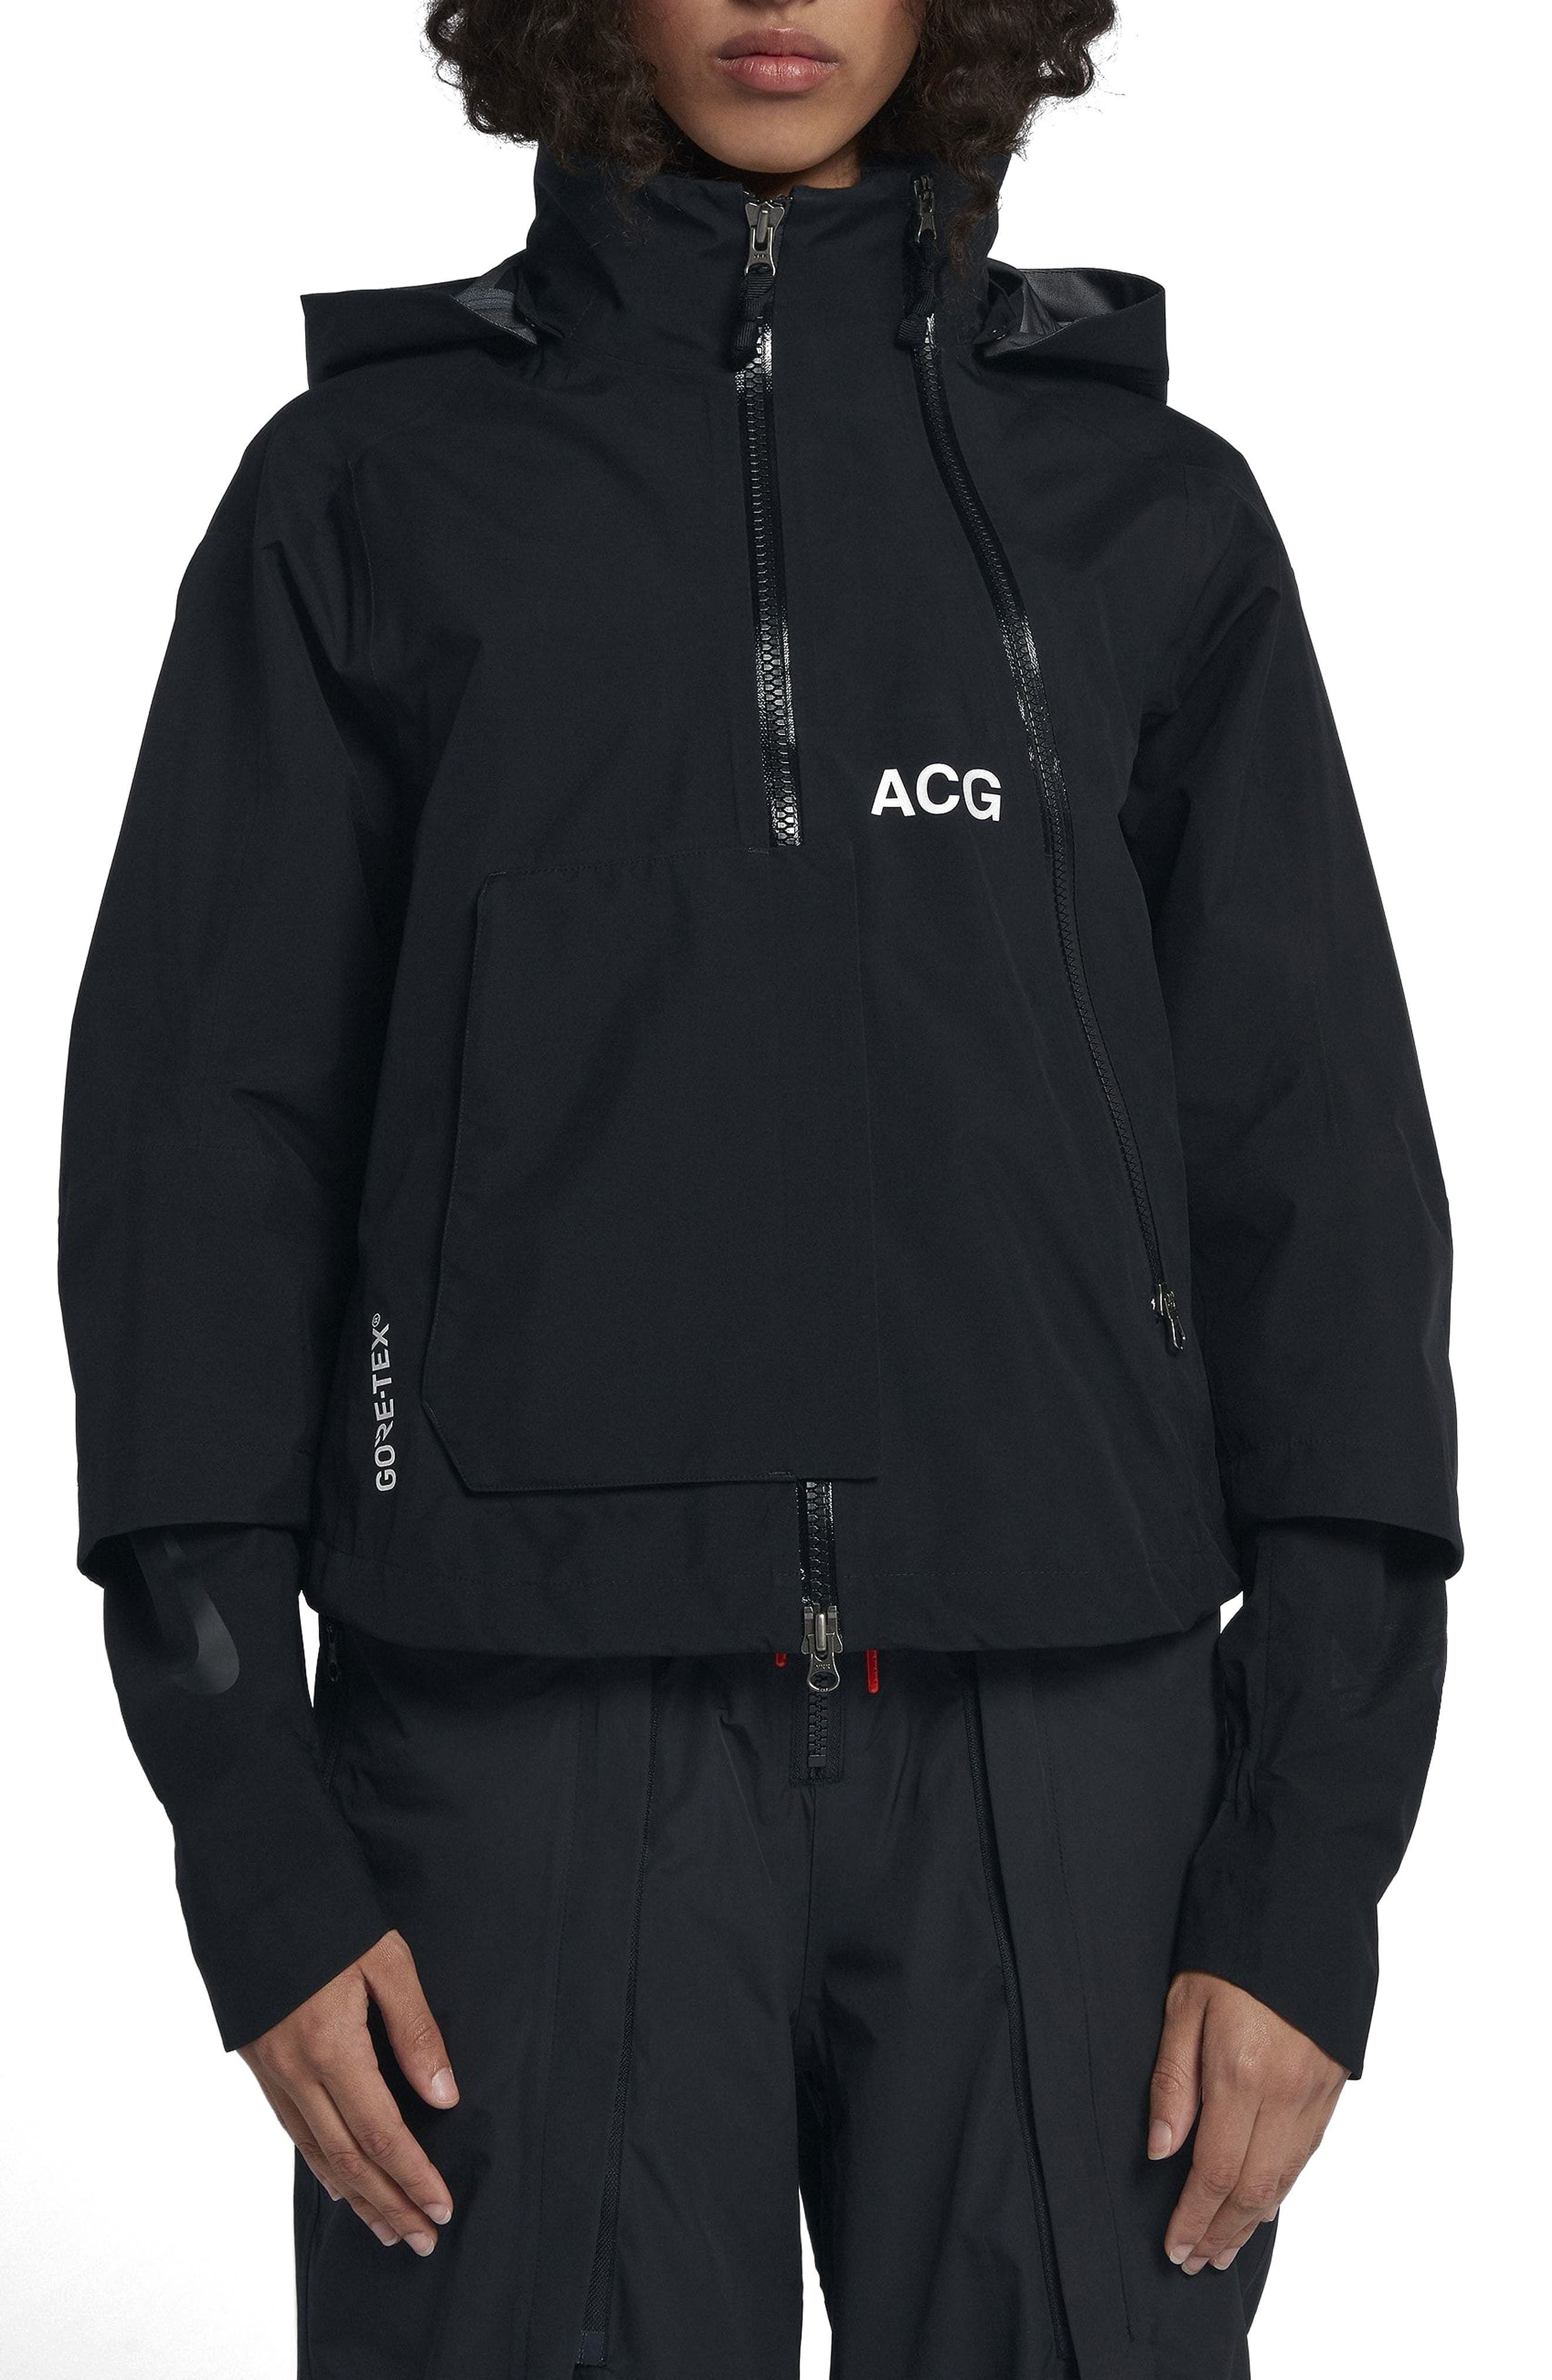 NikeLab ACG Gore-Tex<sup>®</sup> Women's Jacket,                             Main thumbnail 1, color,                             010